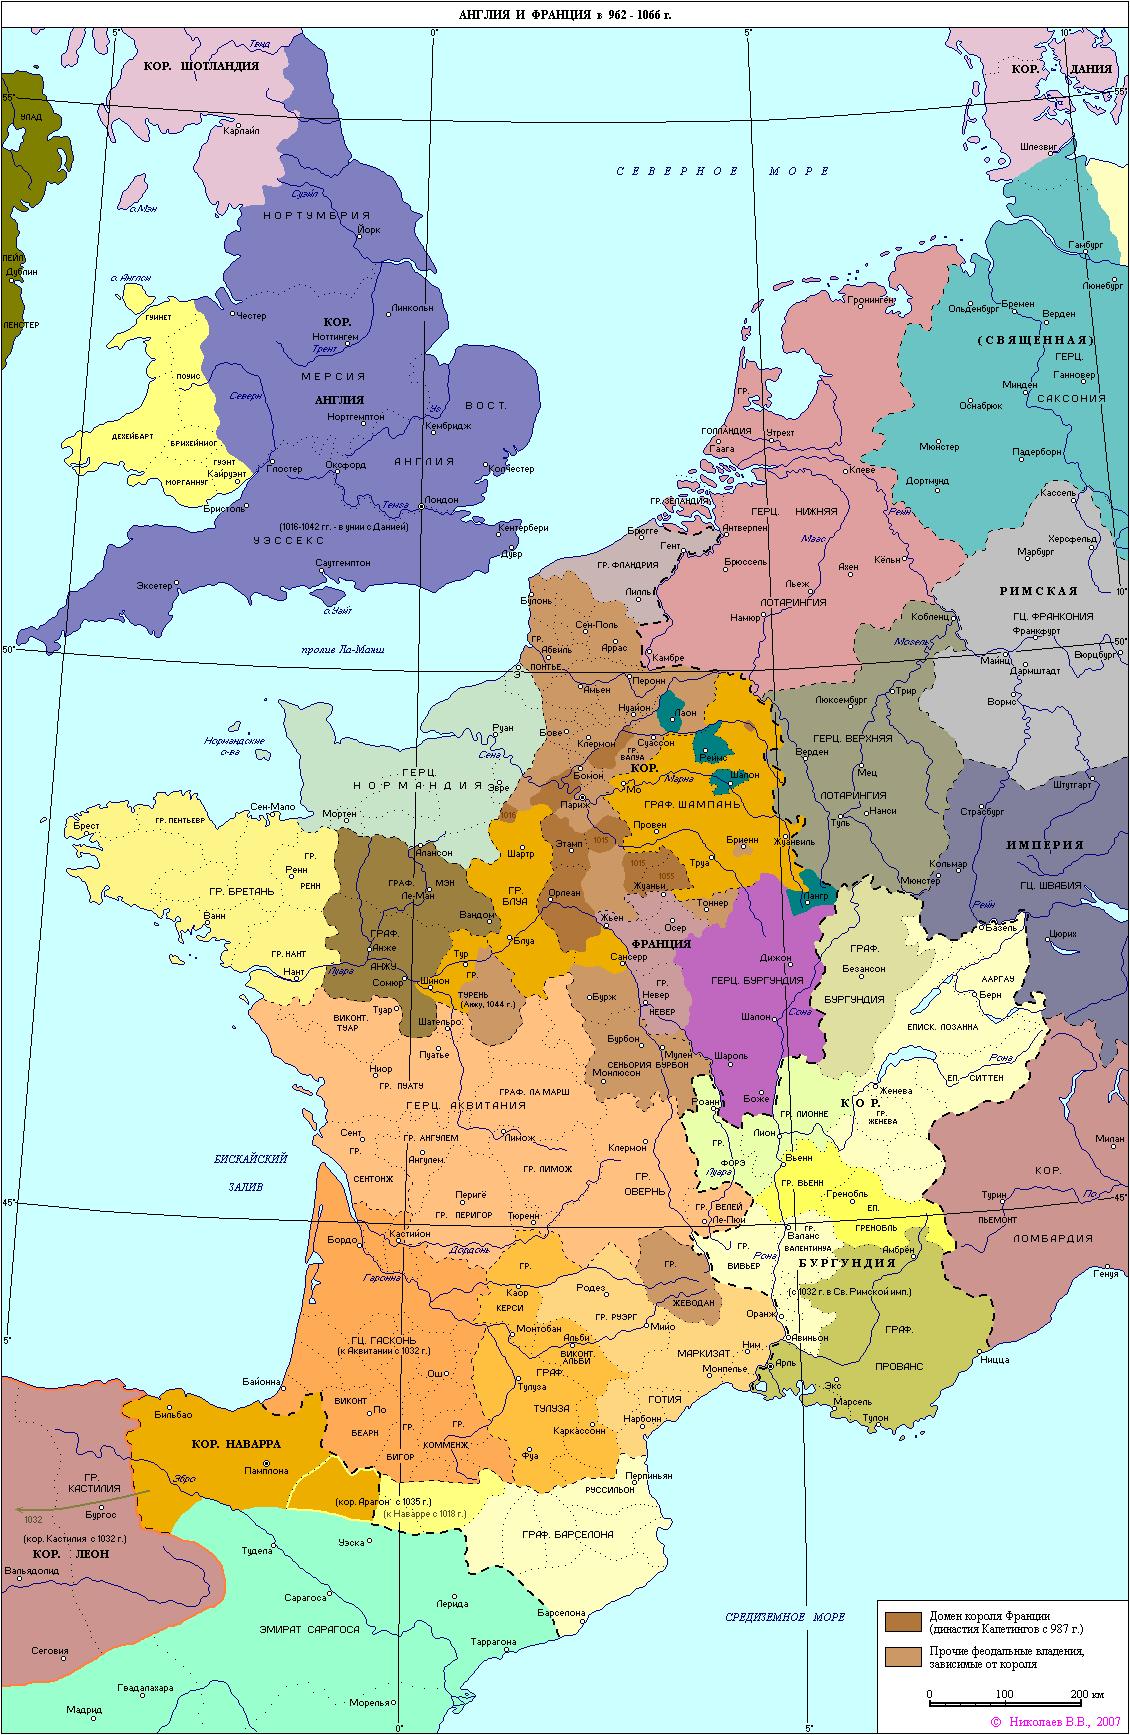 023-europe962-1066